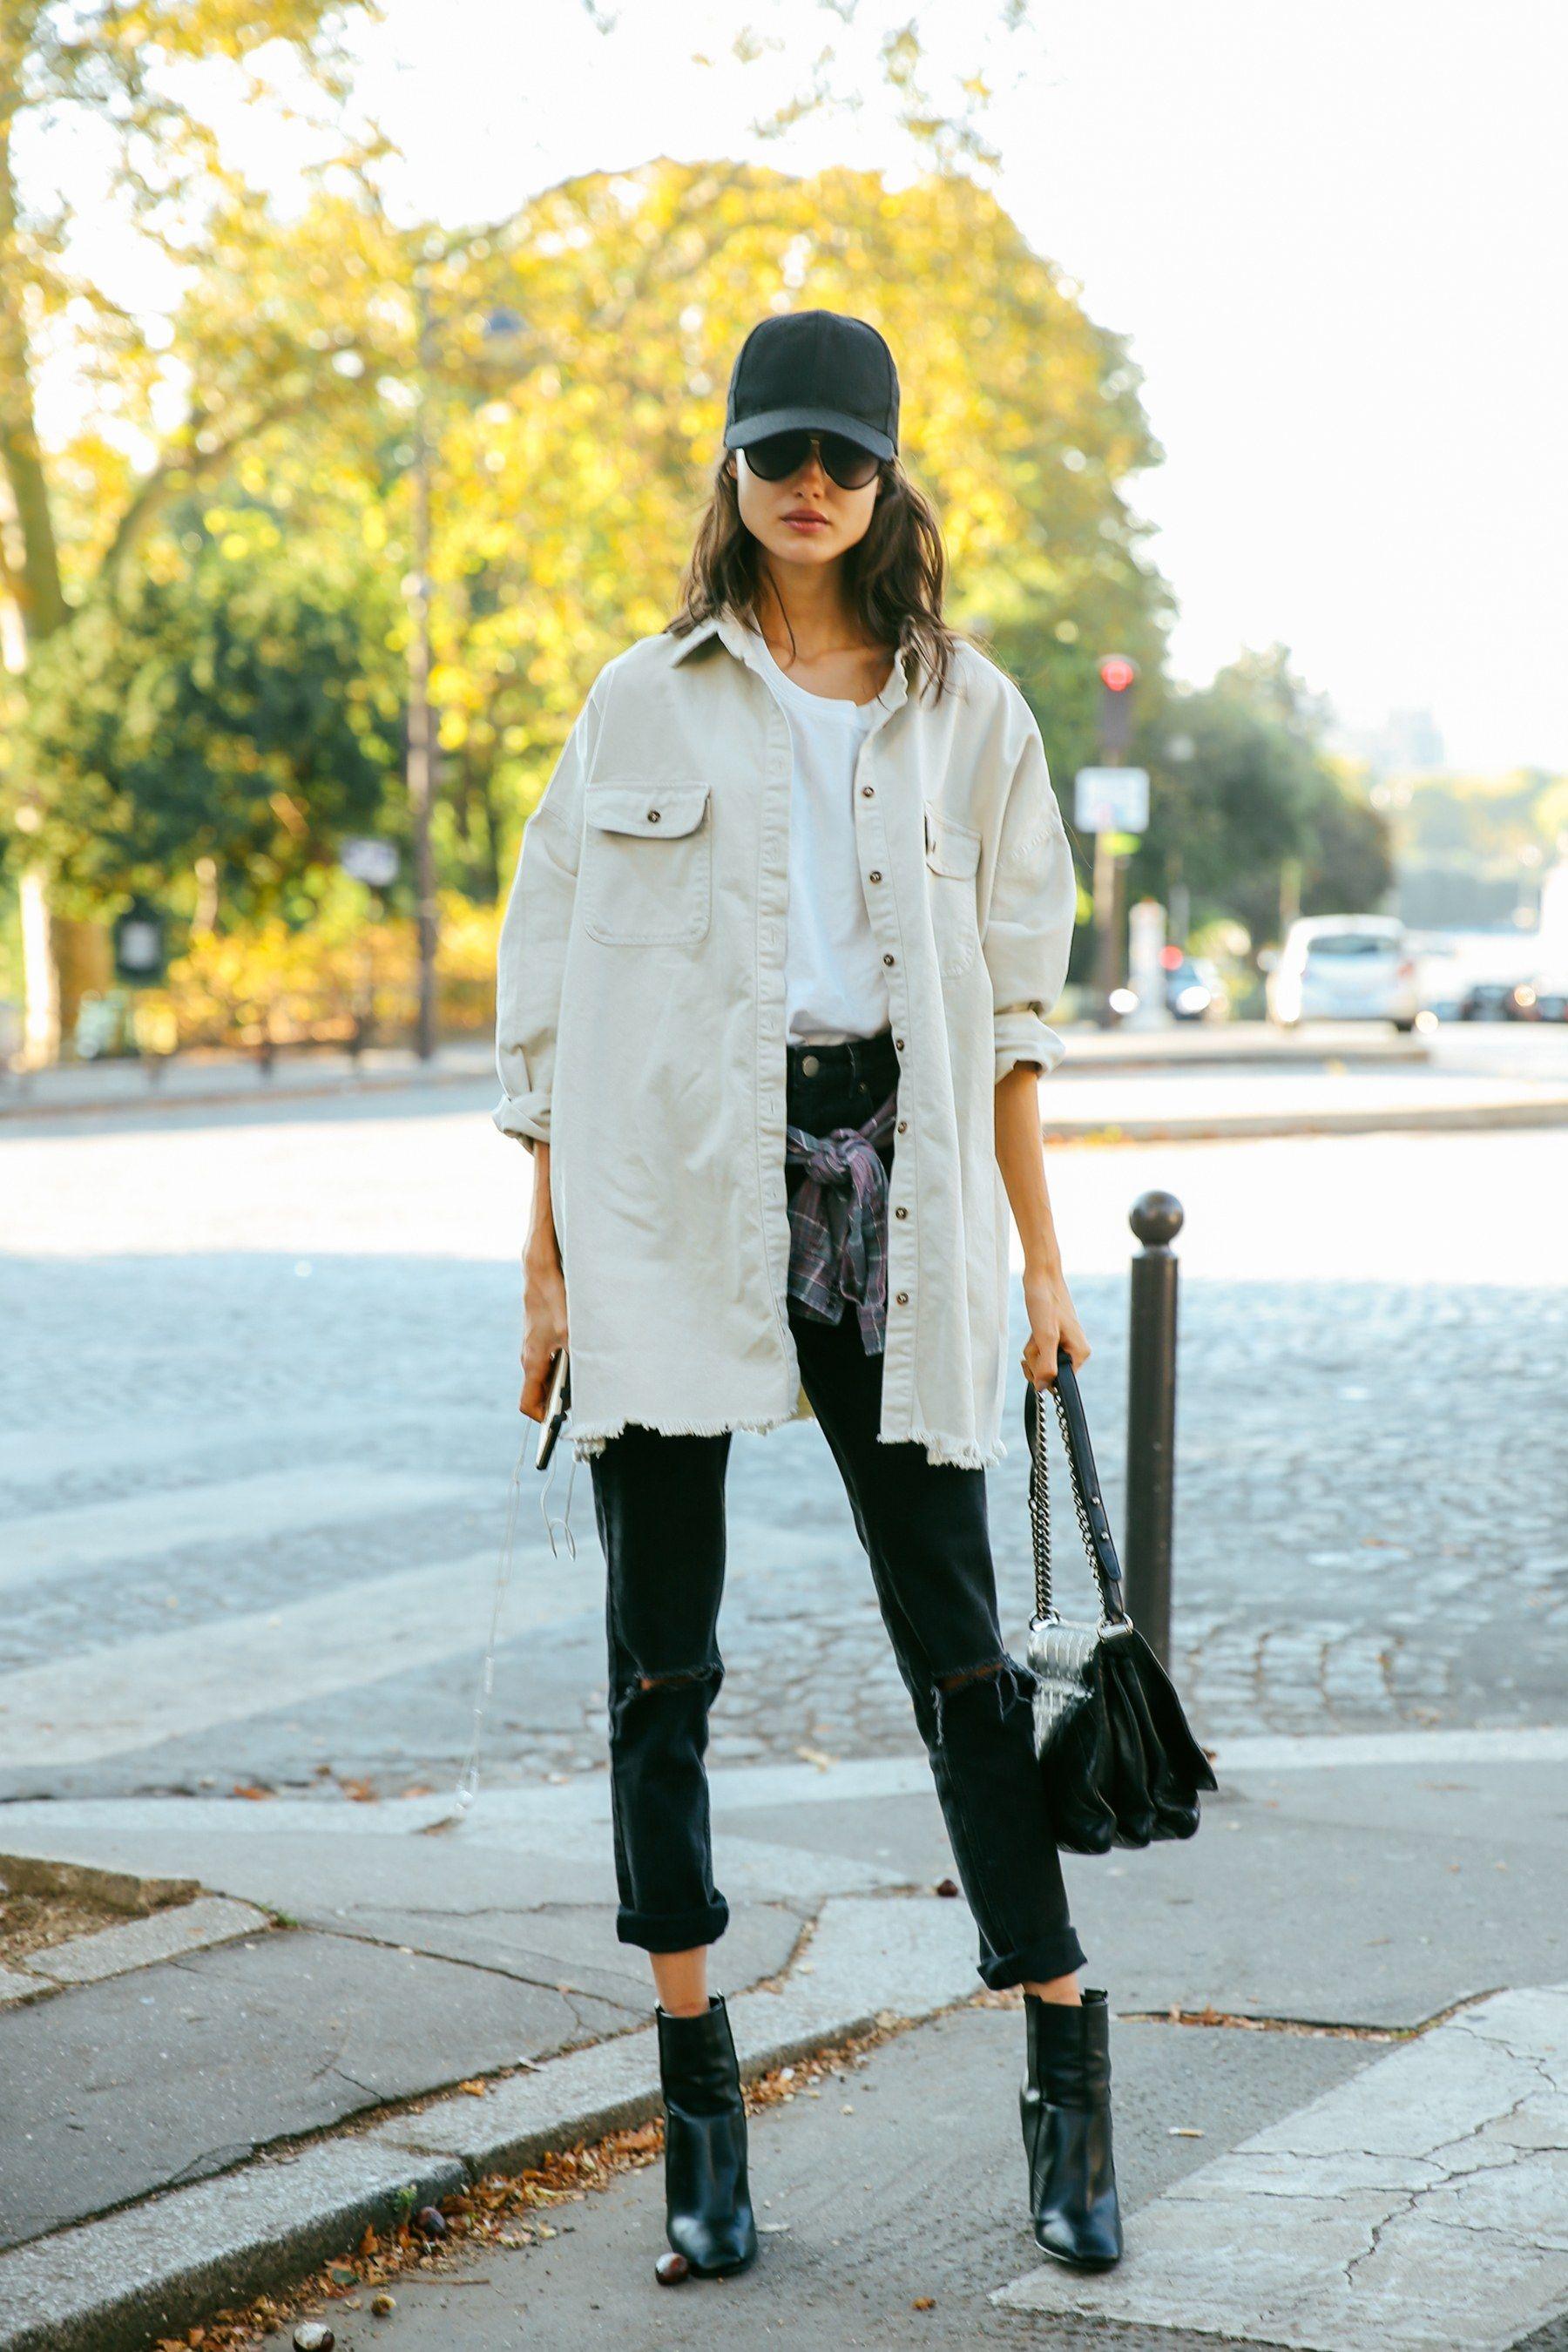 Paris Fashion Week Street Style: See the Photos